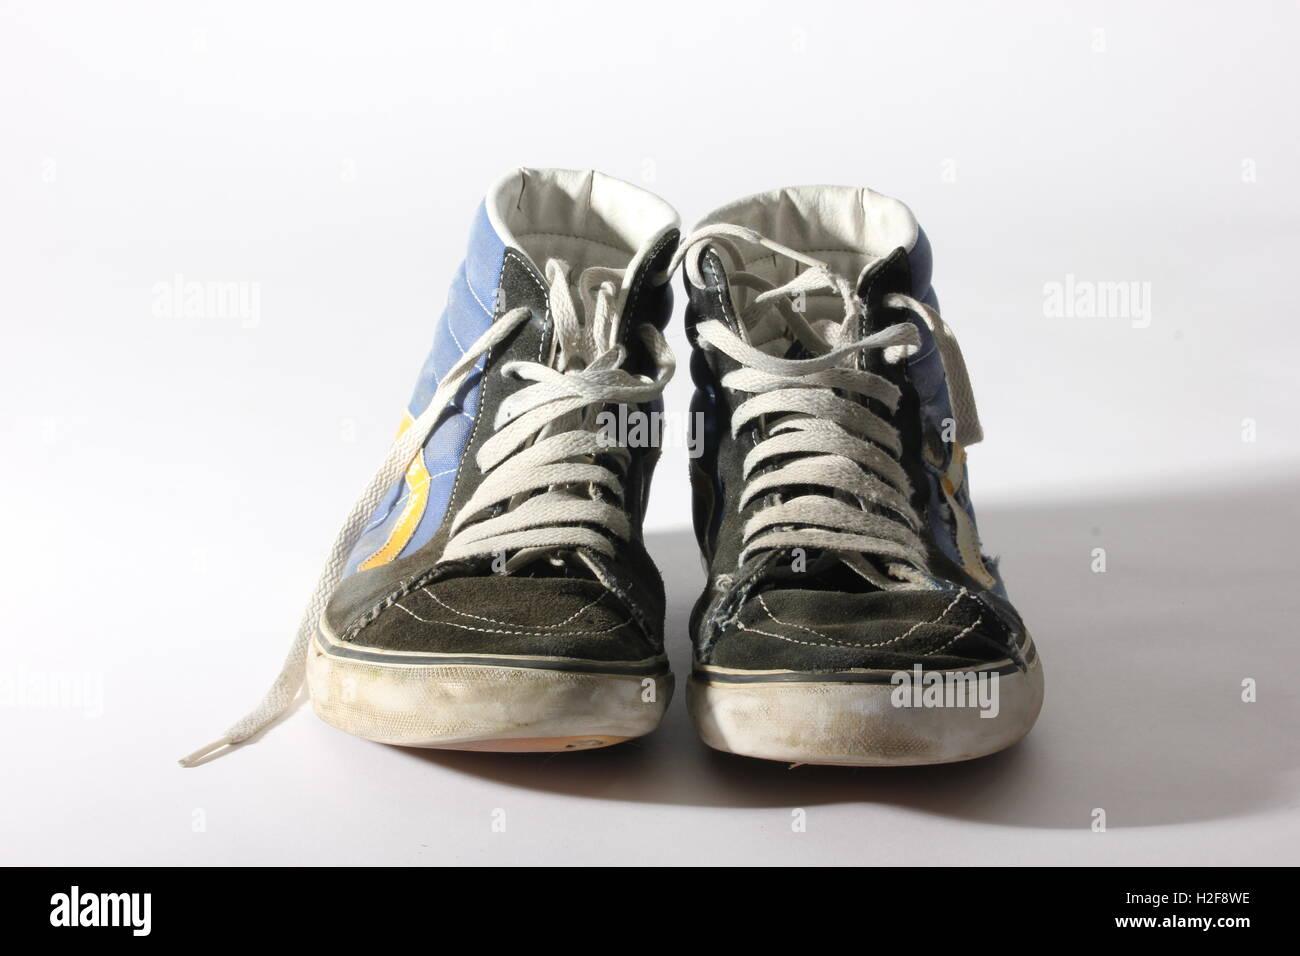 letzter Rabatt groß auswahl neue Sachen warn out vans hi-top skateboard shoes on white background, used ...